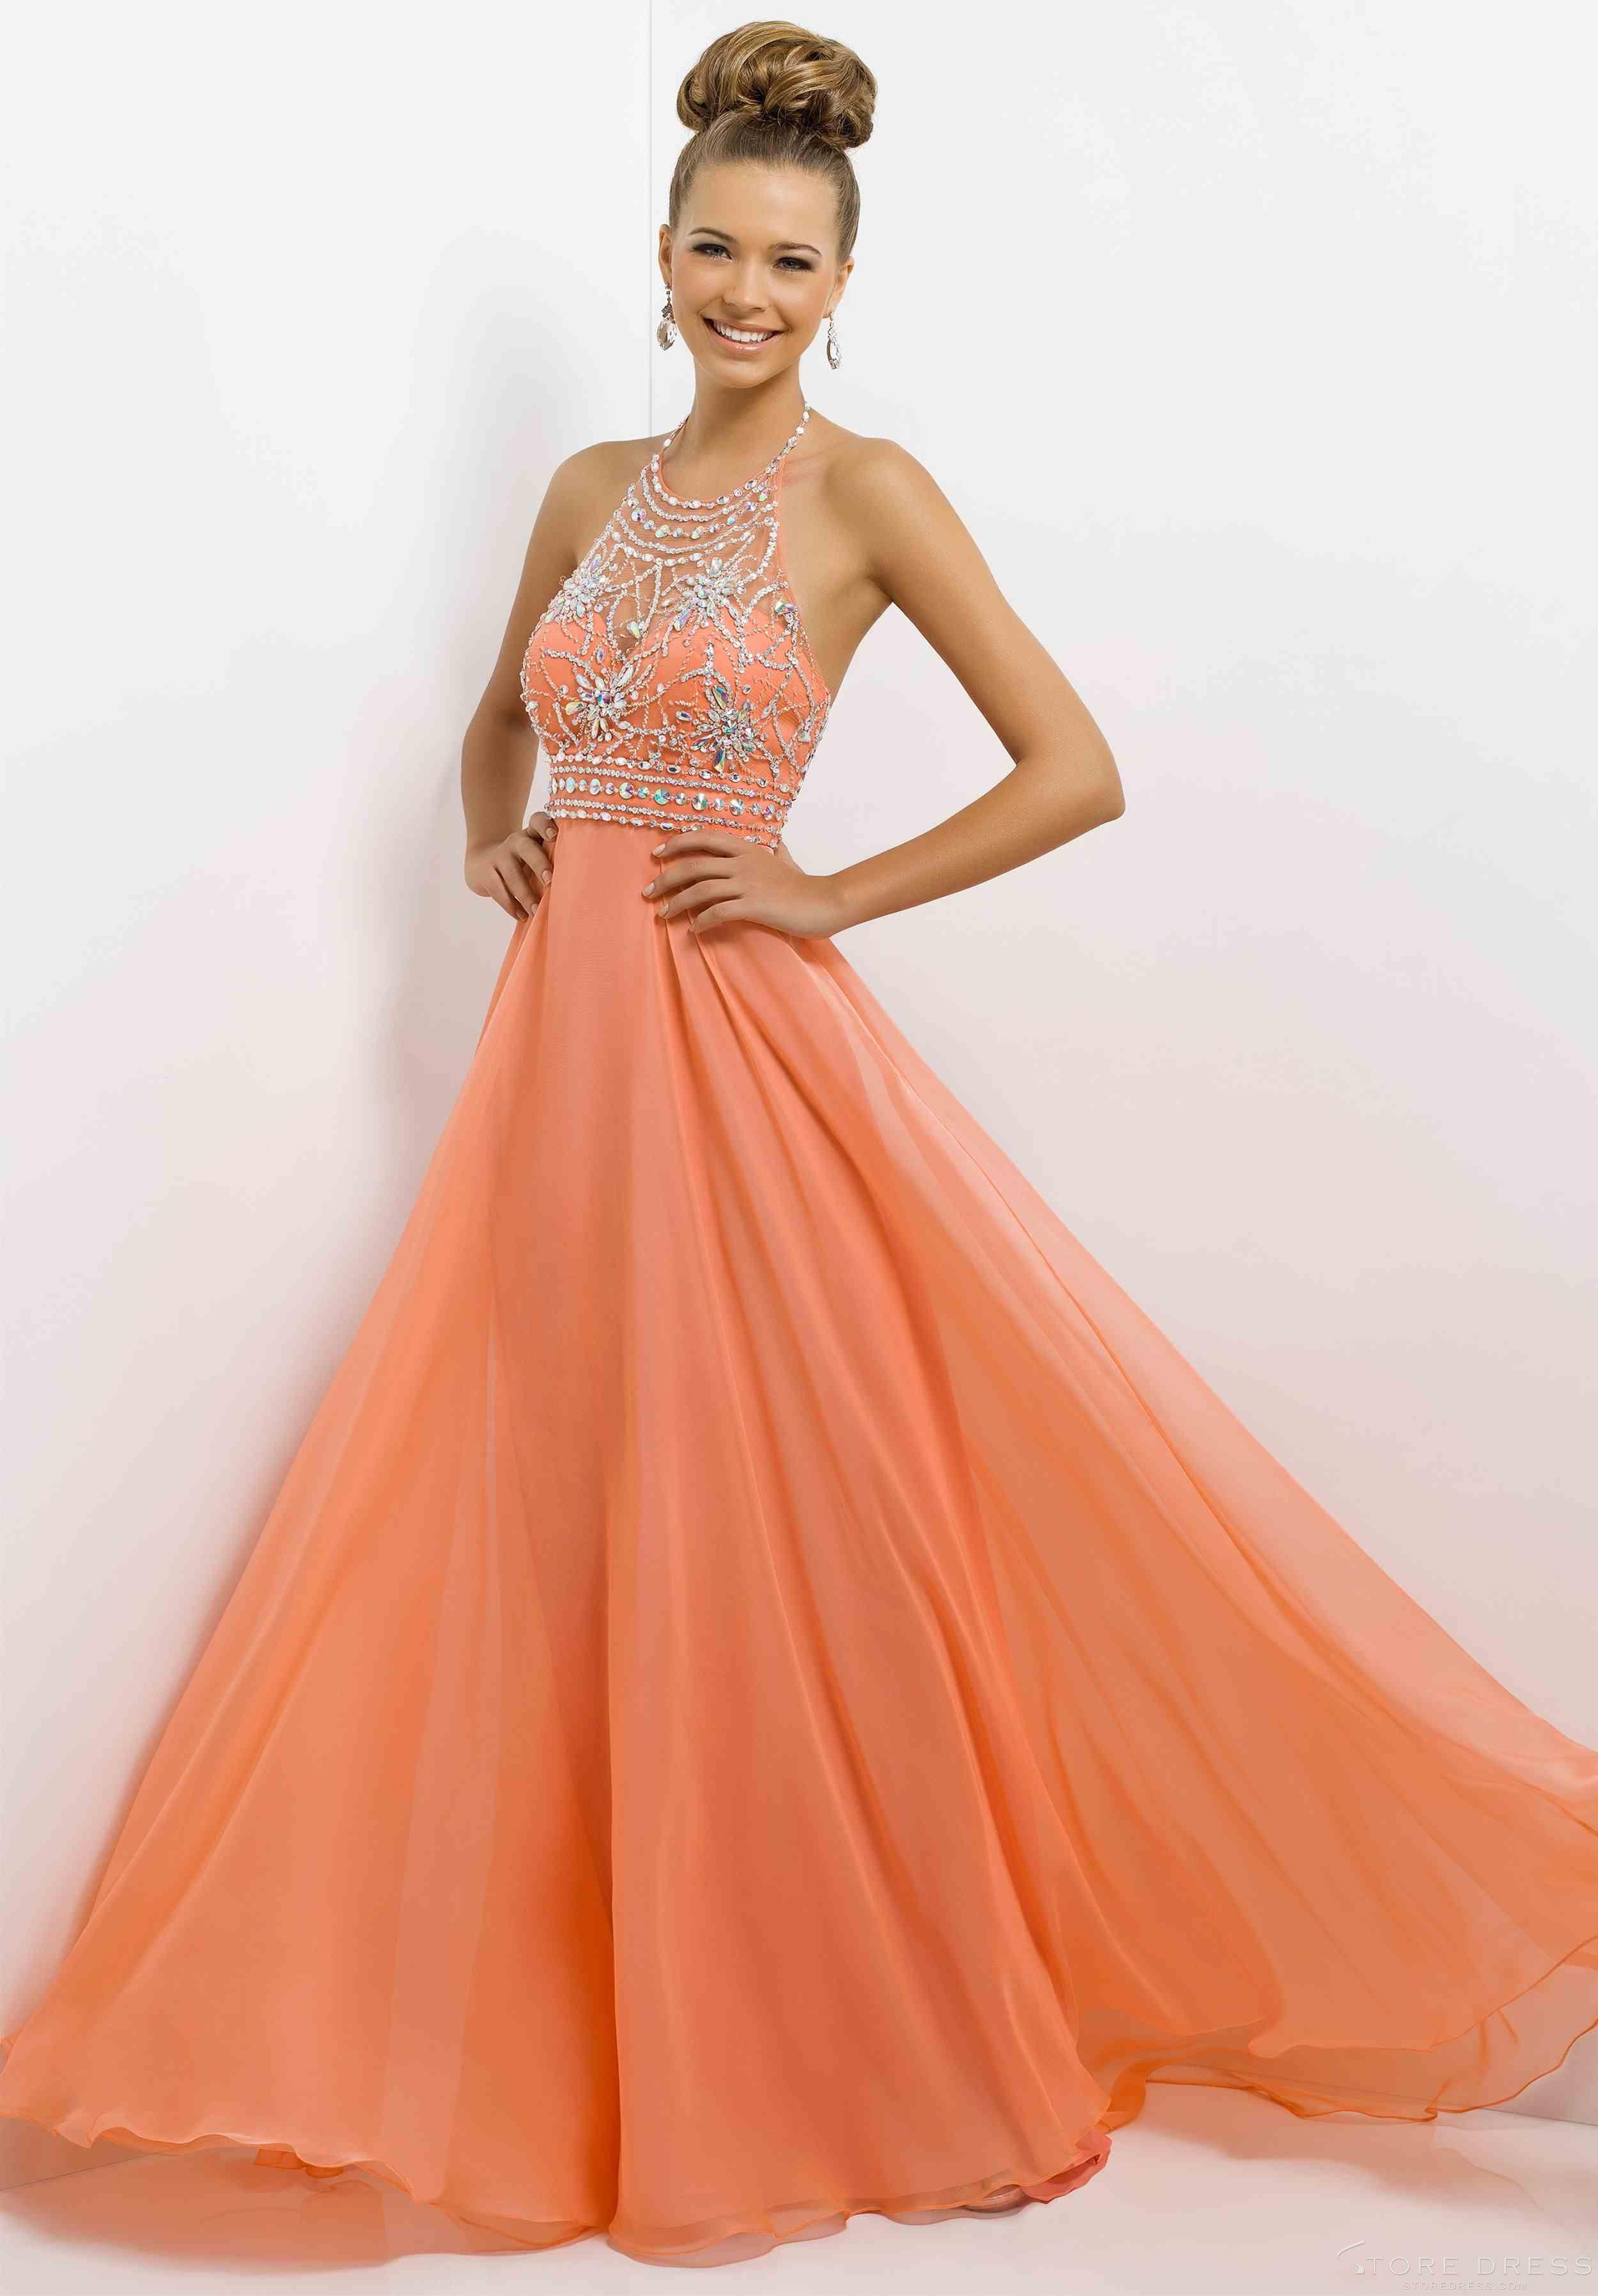 I like the peachorange color dresses they just look so beautiful i